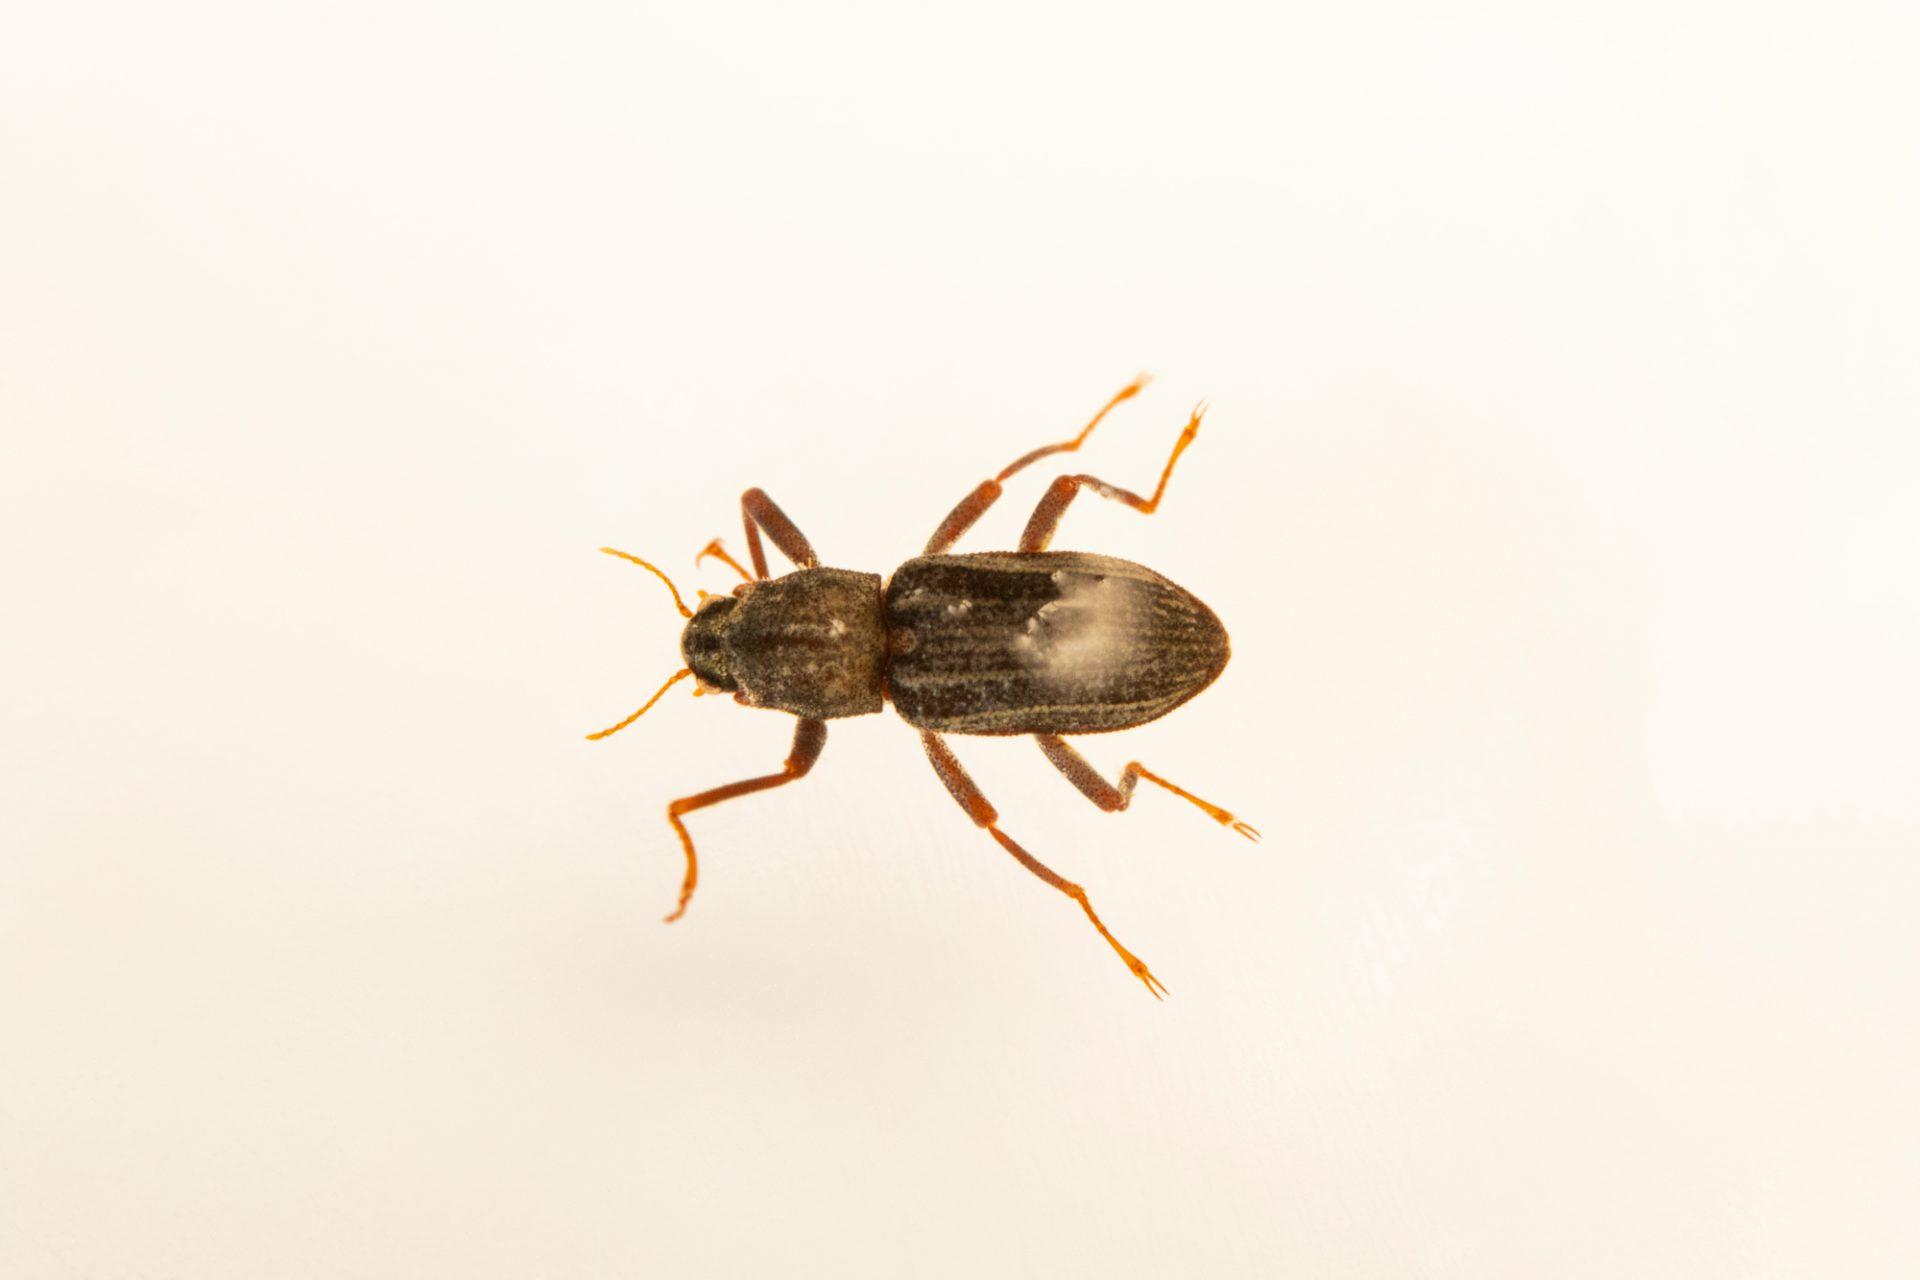 Photo: Devils Hole warm spring riffle beetle (Stenelmis calida calida) at Ash Meadows National Wildlife Refuge in NV.